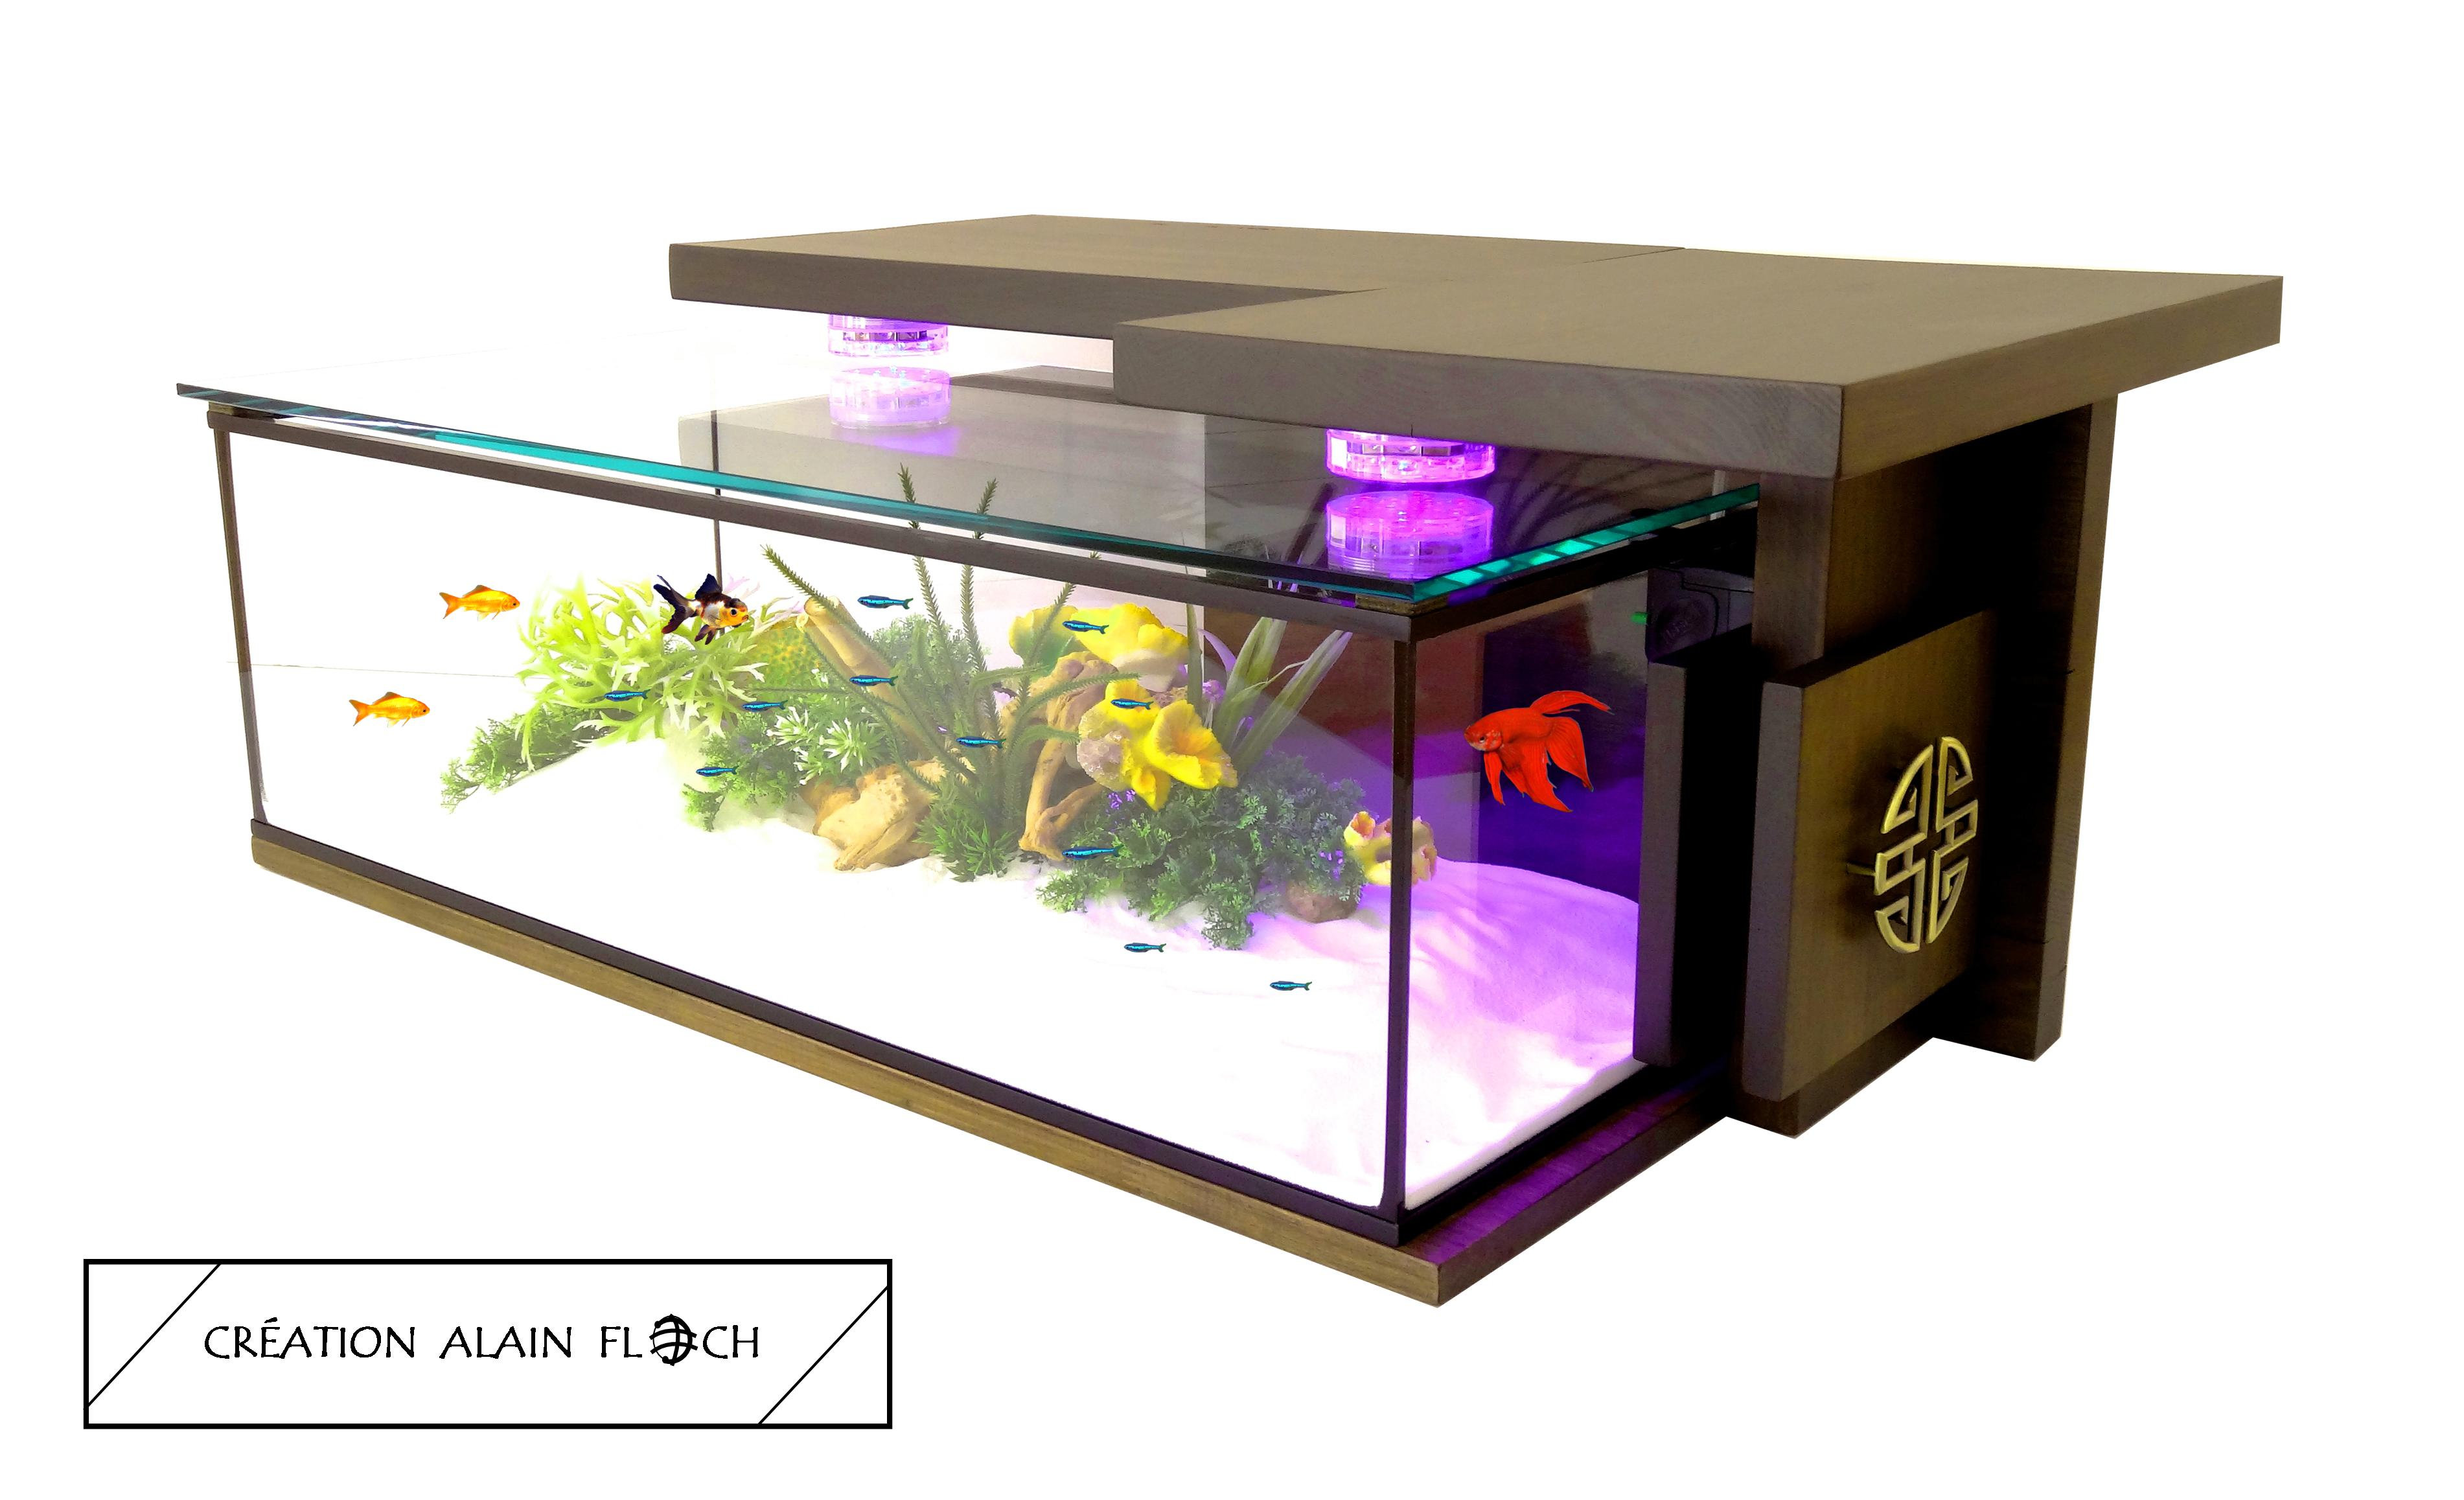 Table Interne Aquarium Monastik LedFiltre 20 Design Basse HE9DI2